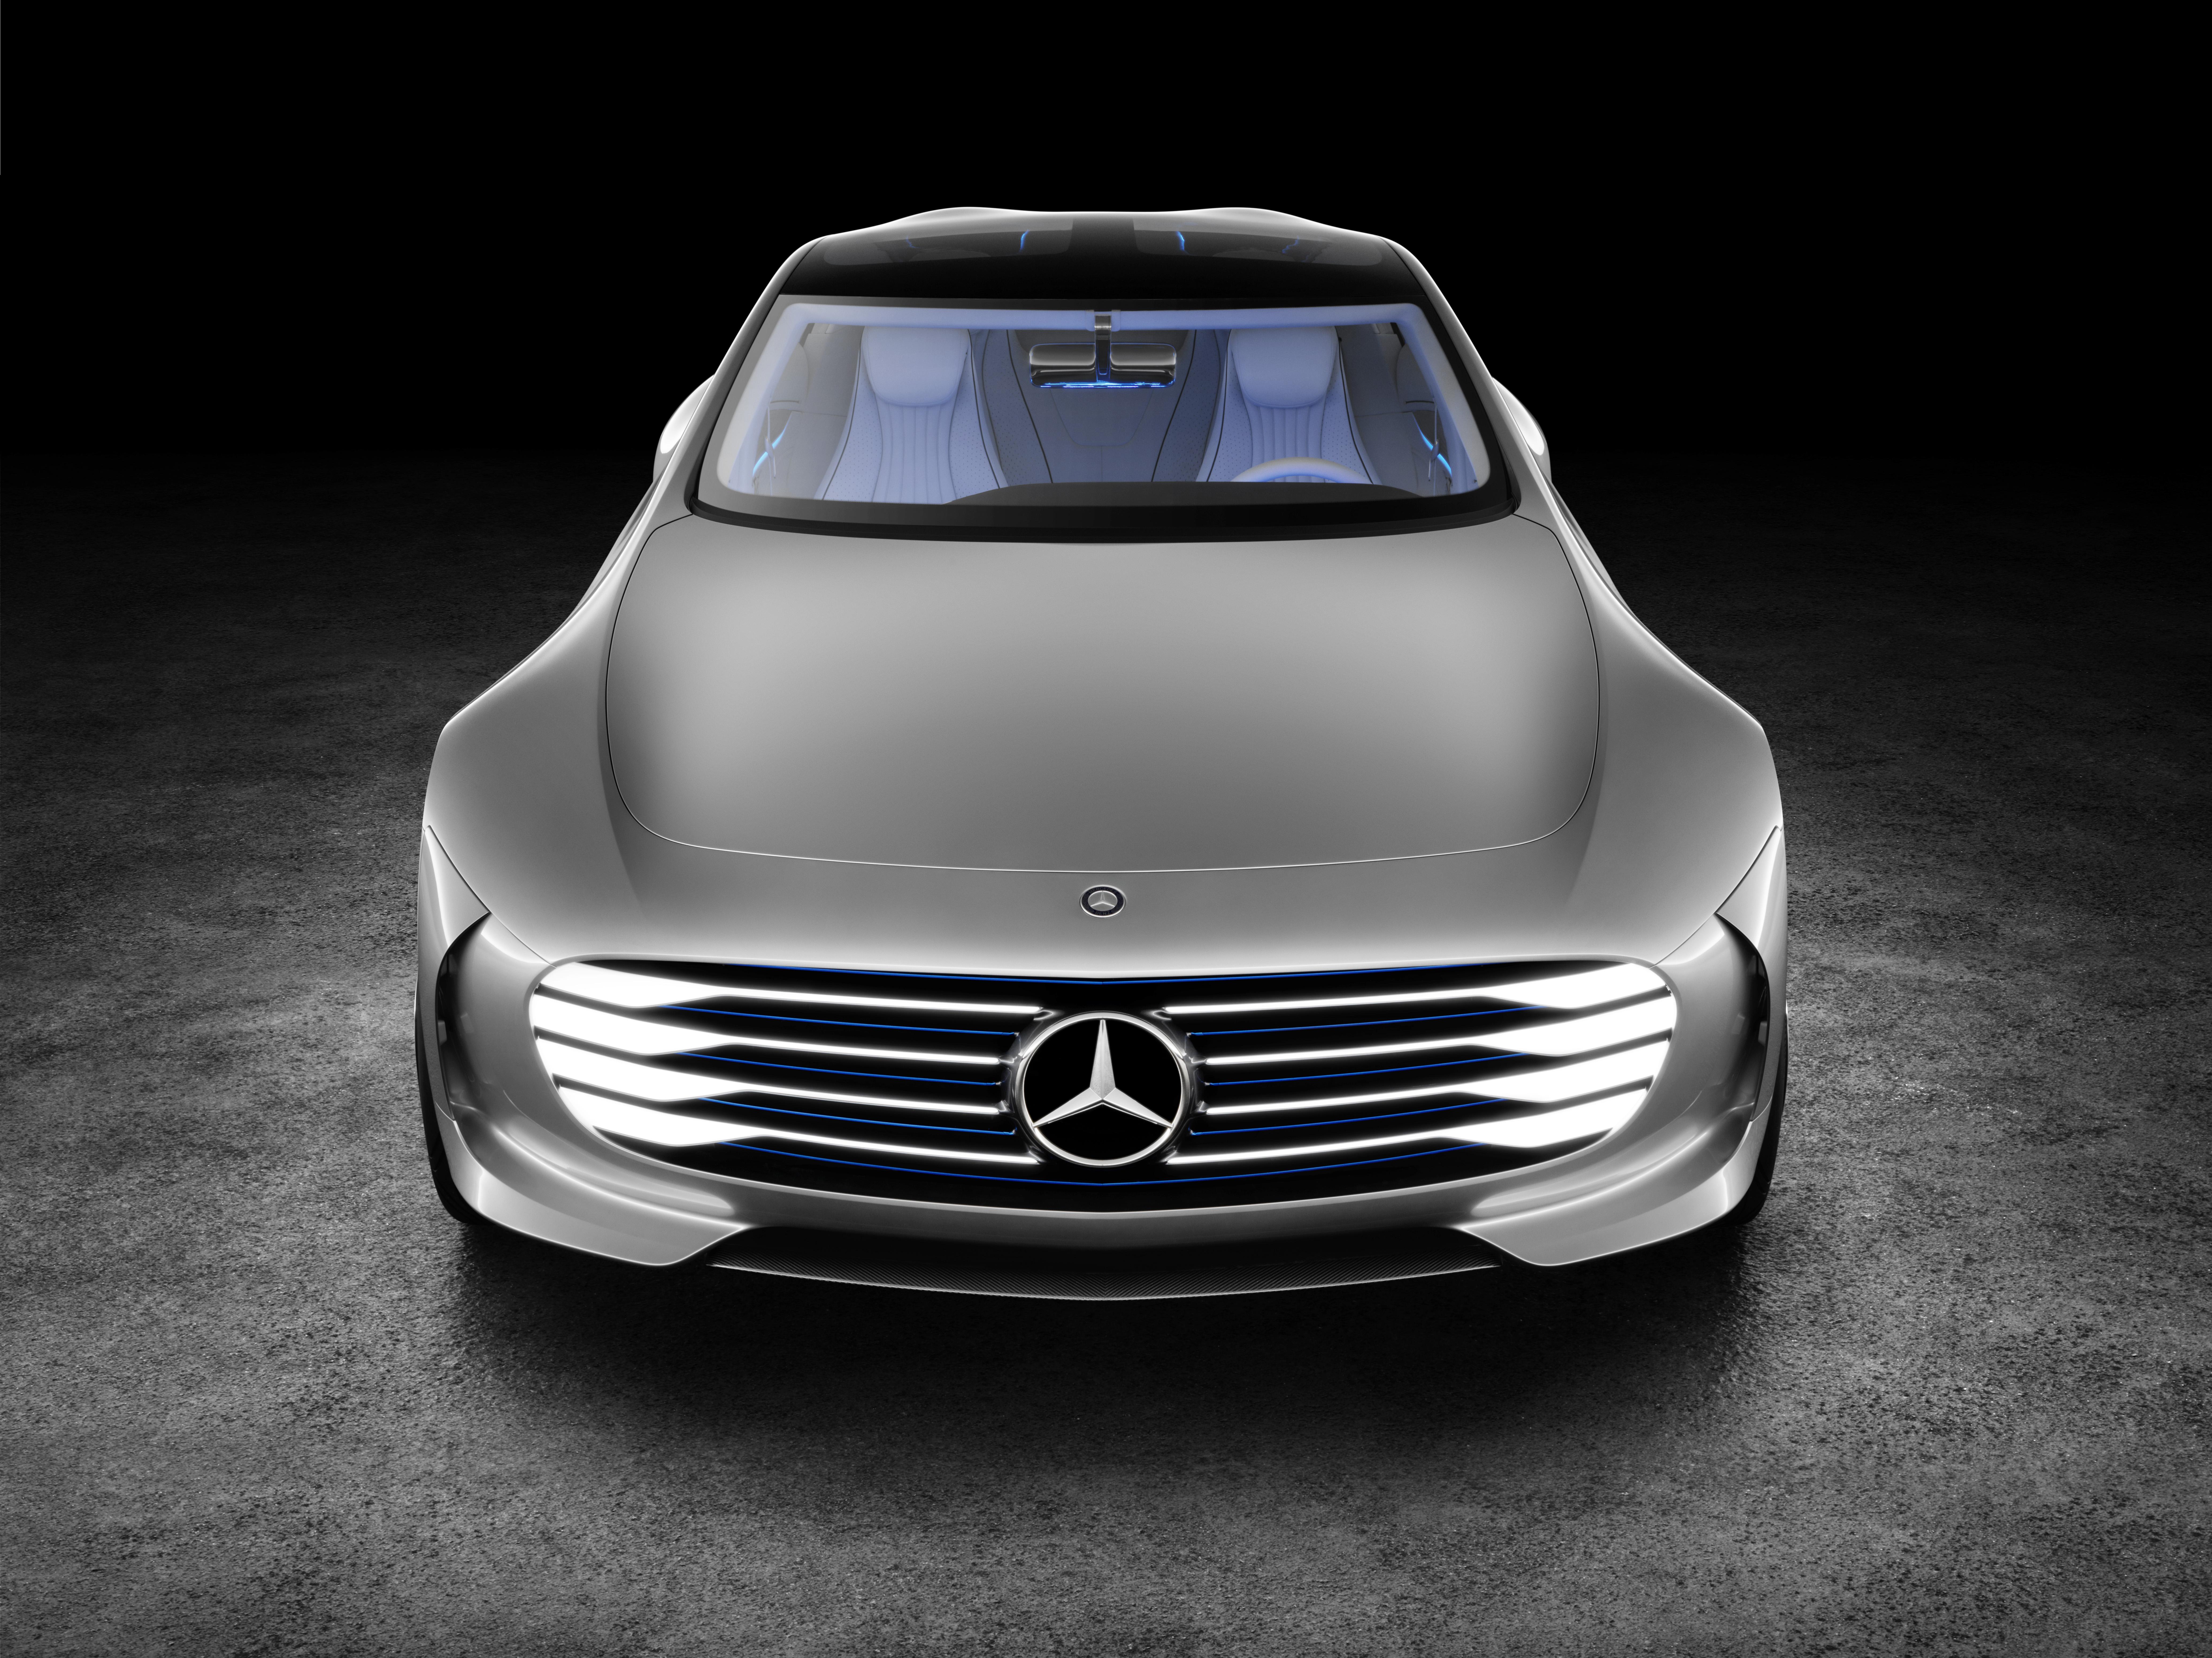 https://www.conceptcarz.com/images/Mercedes-Benz/Mercedes-Benz-Concept-IIA_2015-Image-04.jpg